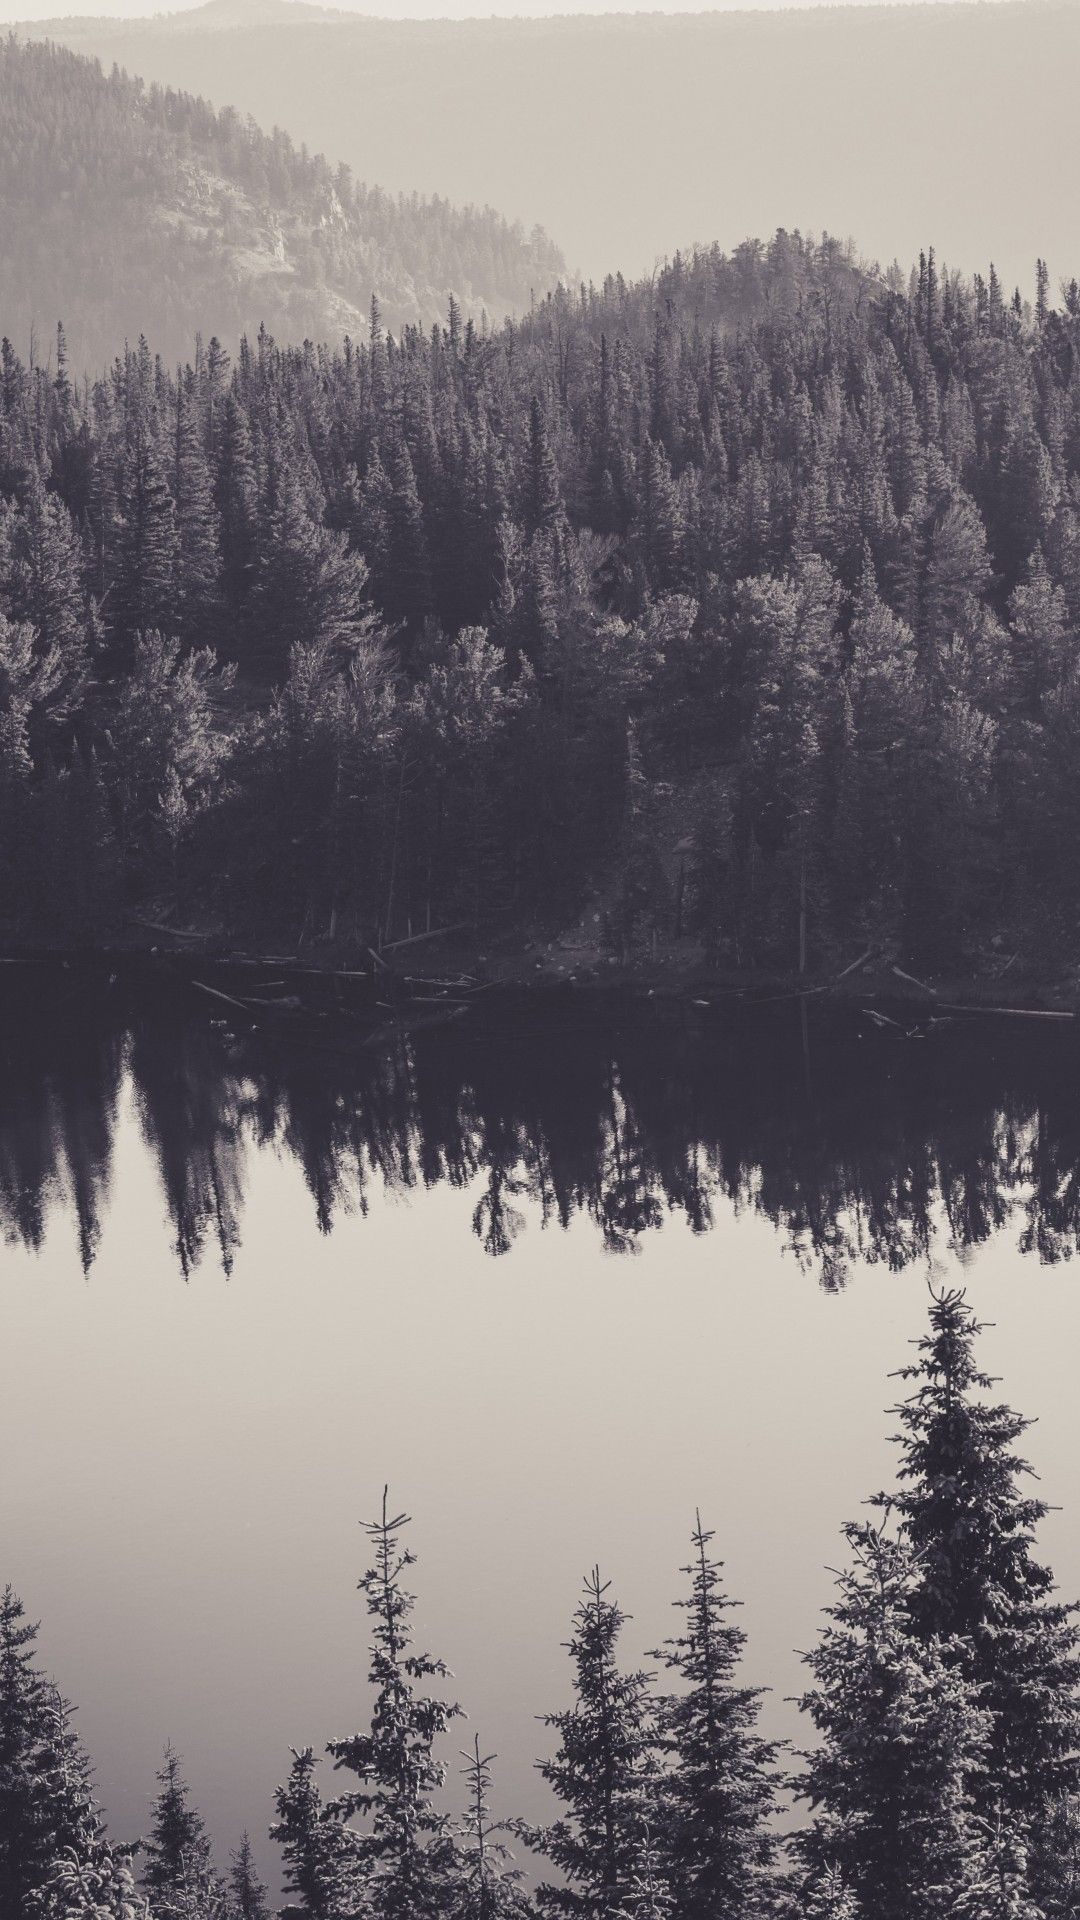 Iphone wallpaper tumblr travel - Dark Wallpaper 4k Black And White Iphone 6 Plus Wallpaper